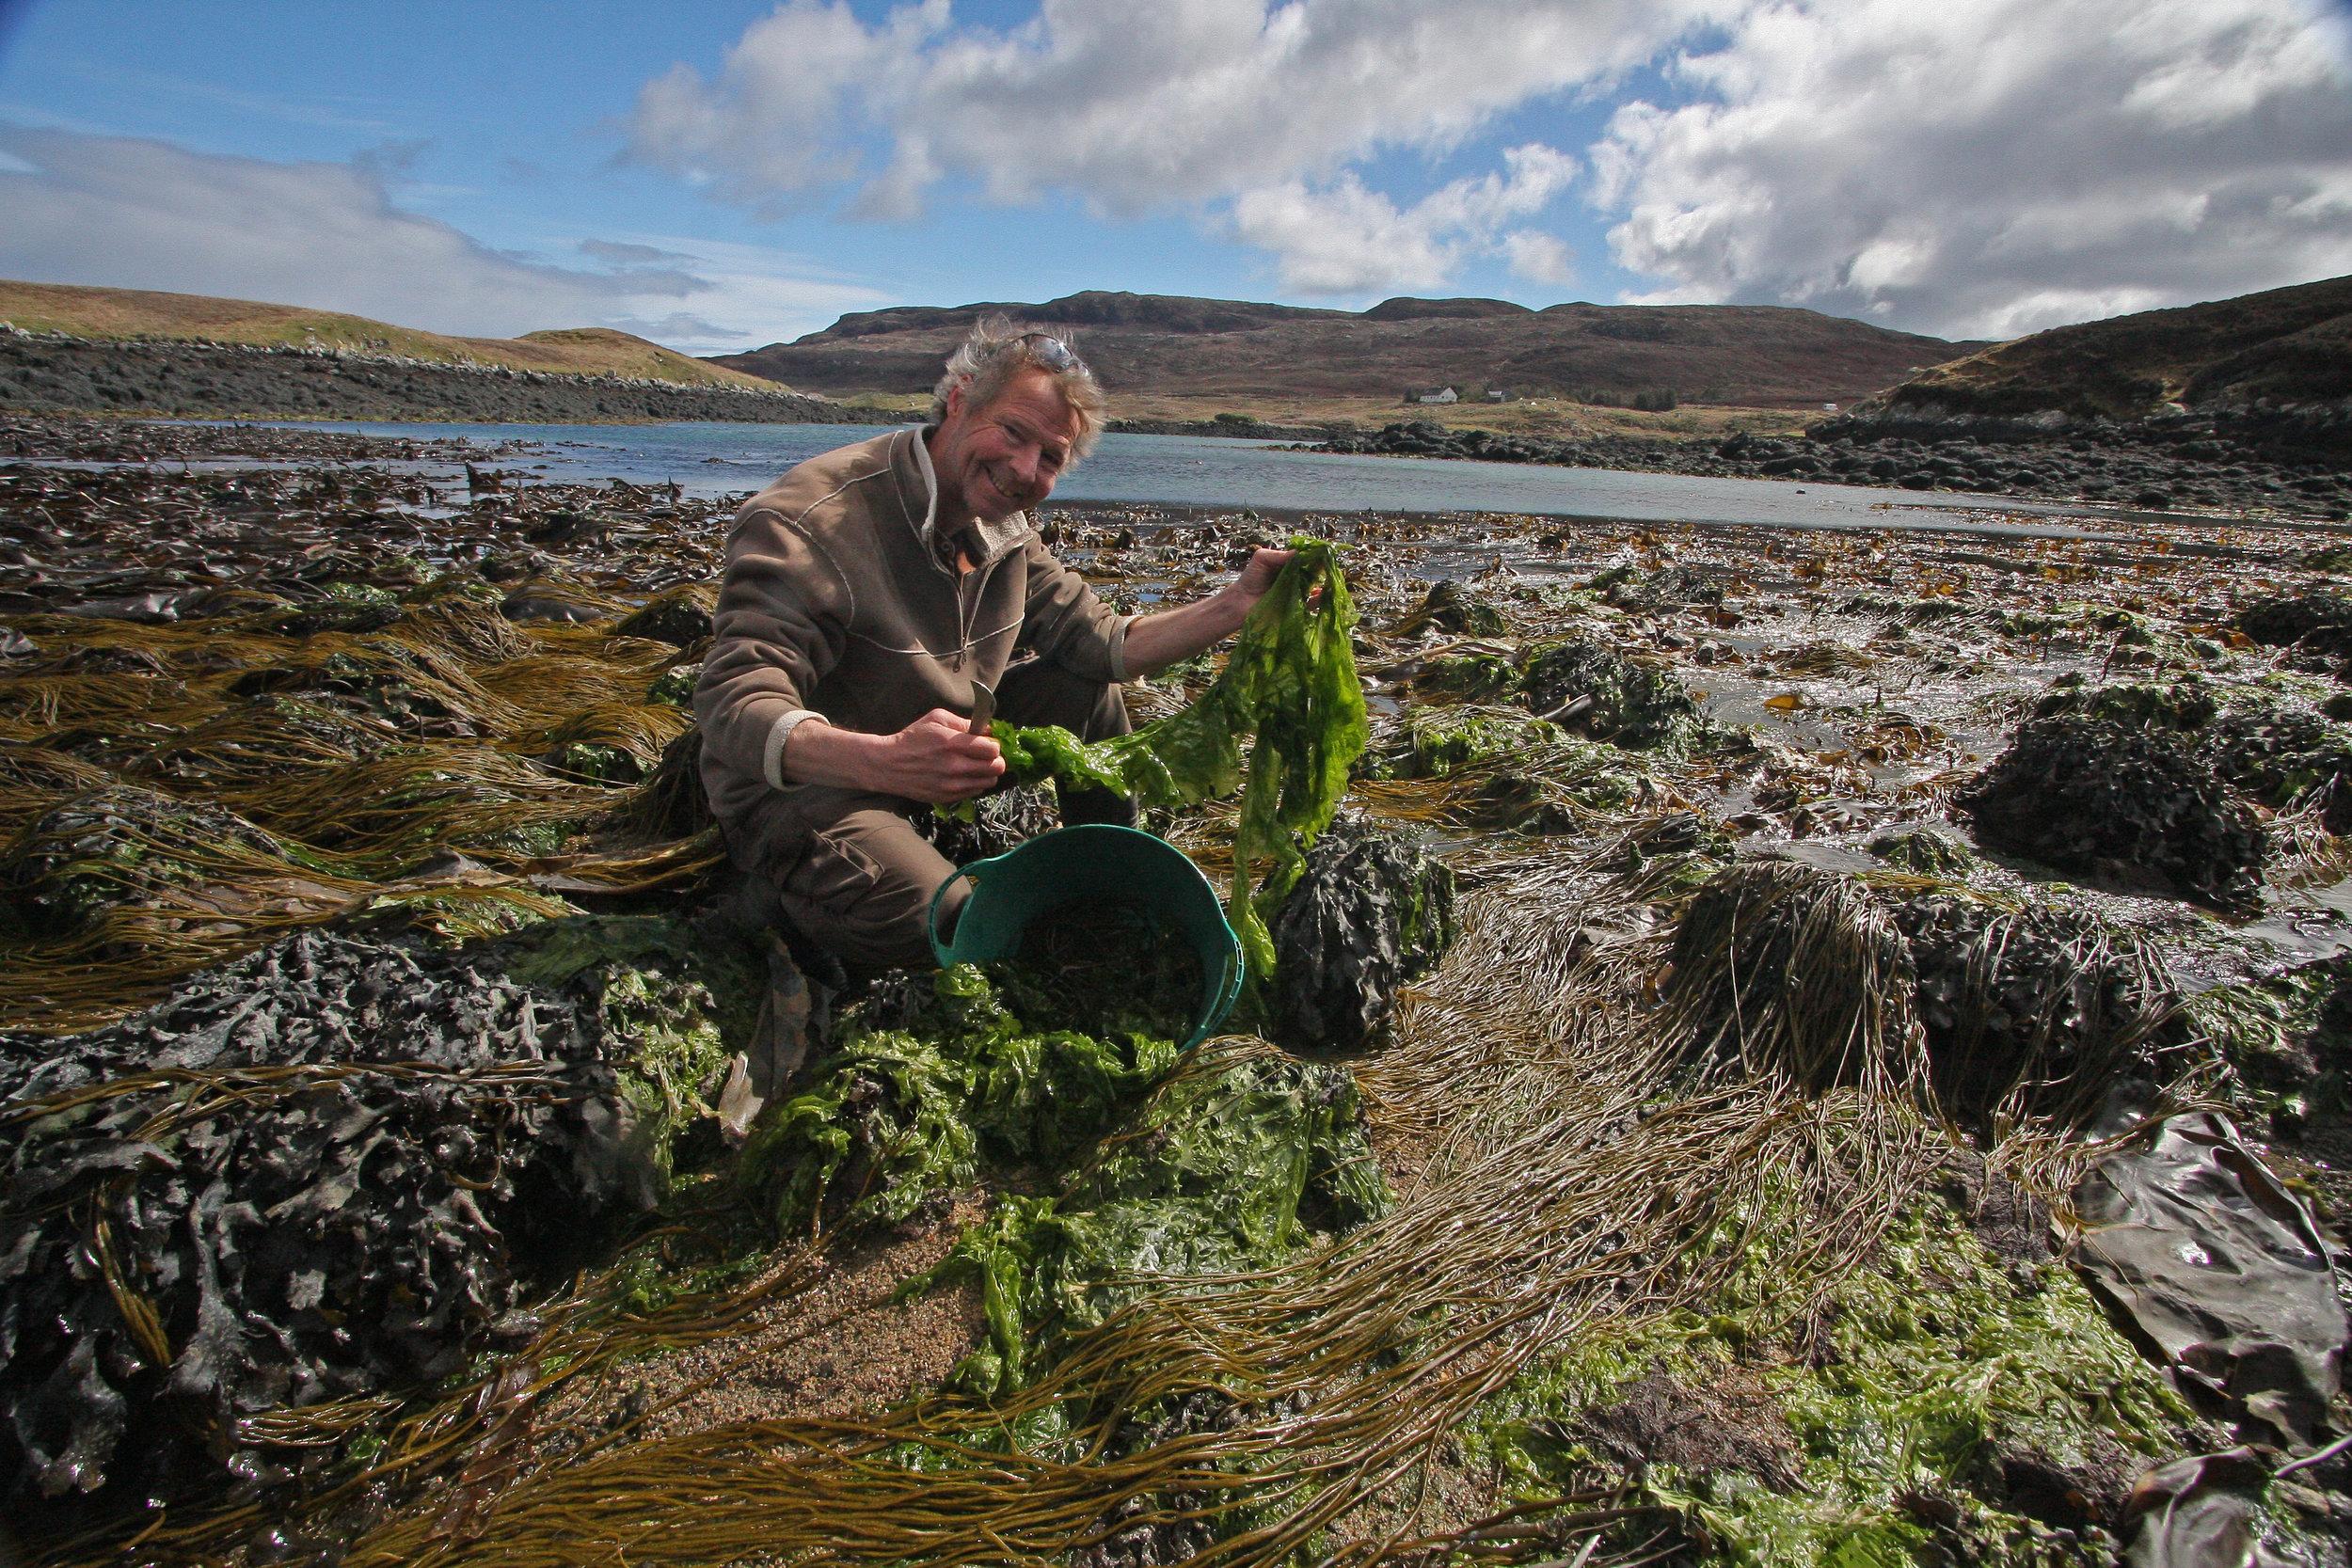 John Cunningham, JONAA's Marine Science Editor collecting seaweed in the Scottish Hebrides. JONAA©John Cunningham